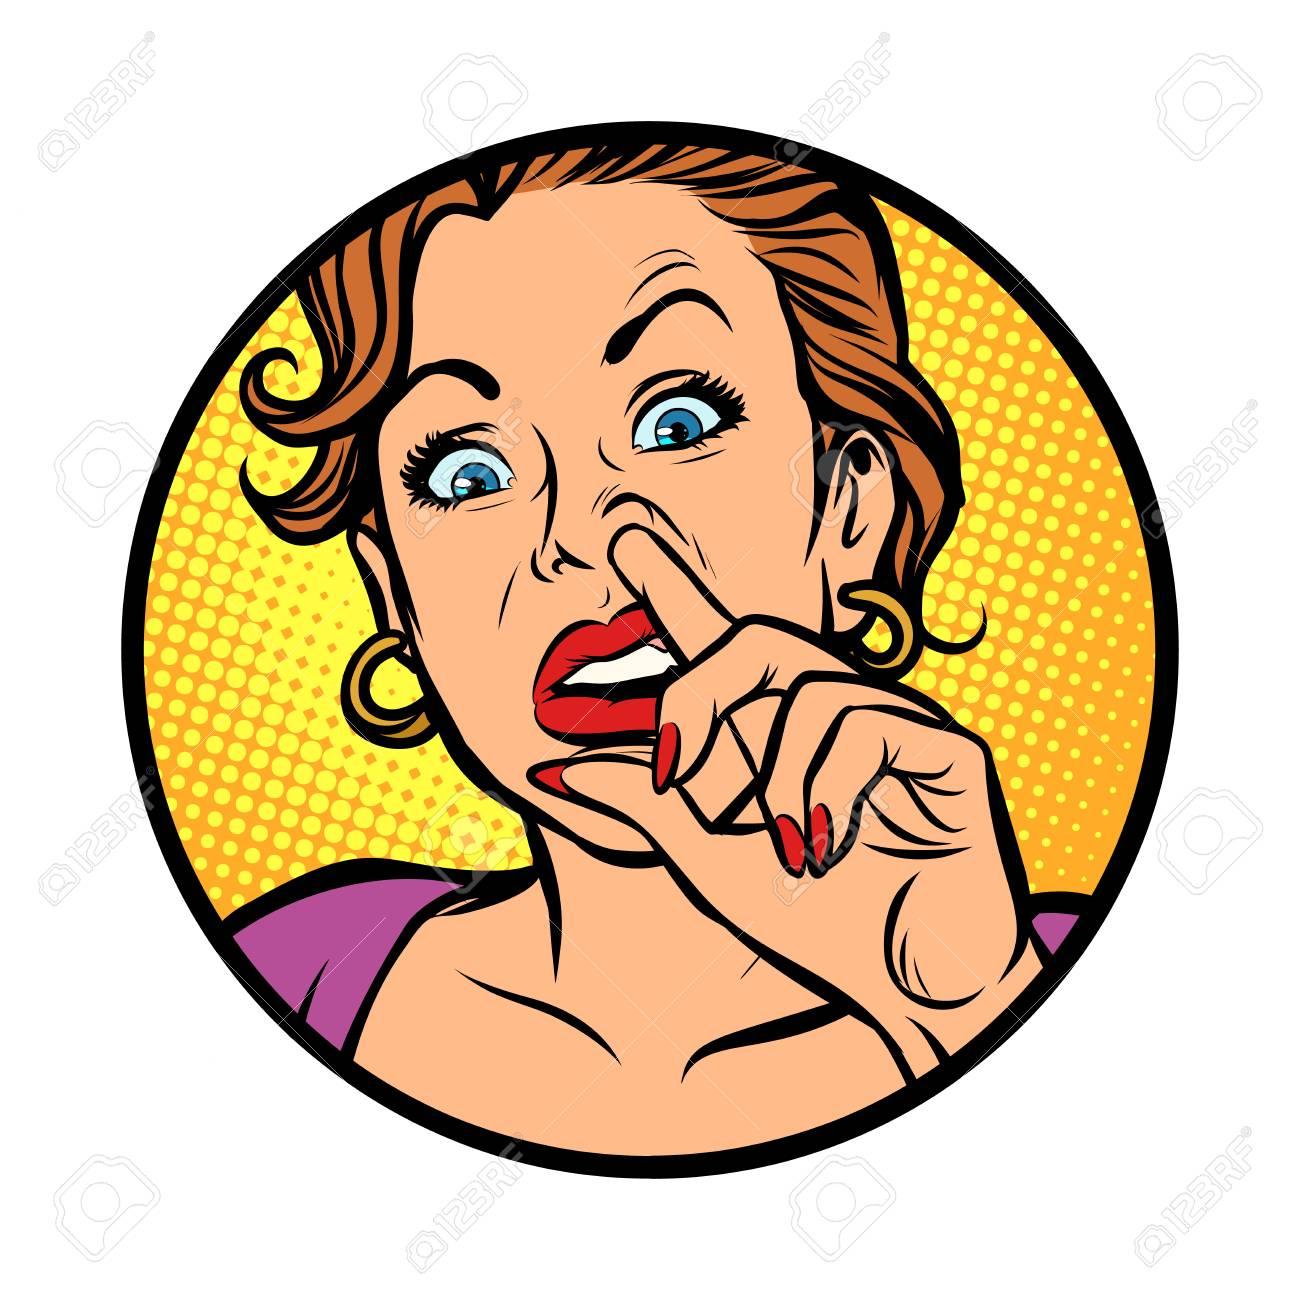 Symbol Icon Woman Picking Nose Comic Cartoon Pop Art Retro Royalty Free Cliparts Vectors And Stock Illustration Image 110717102